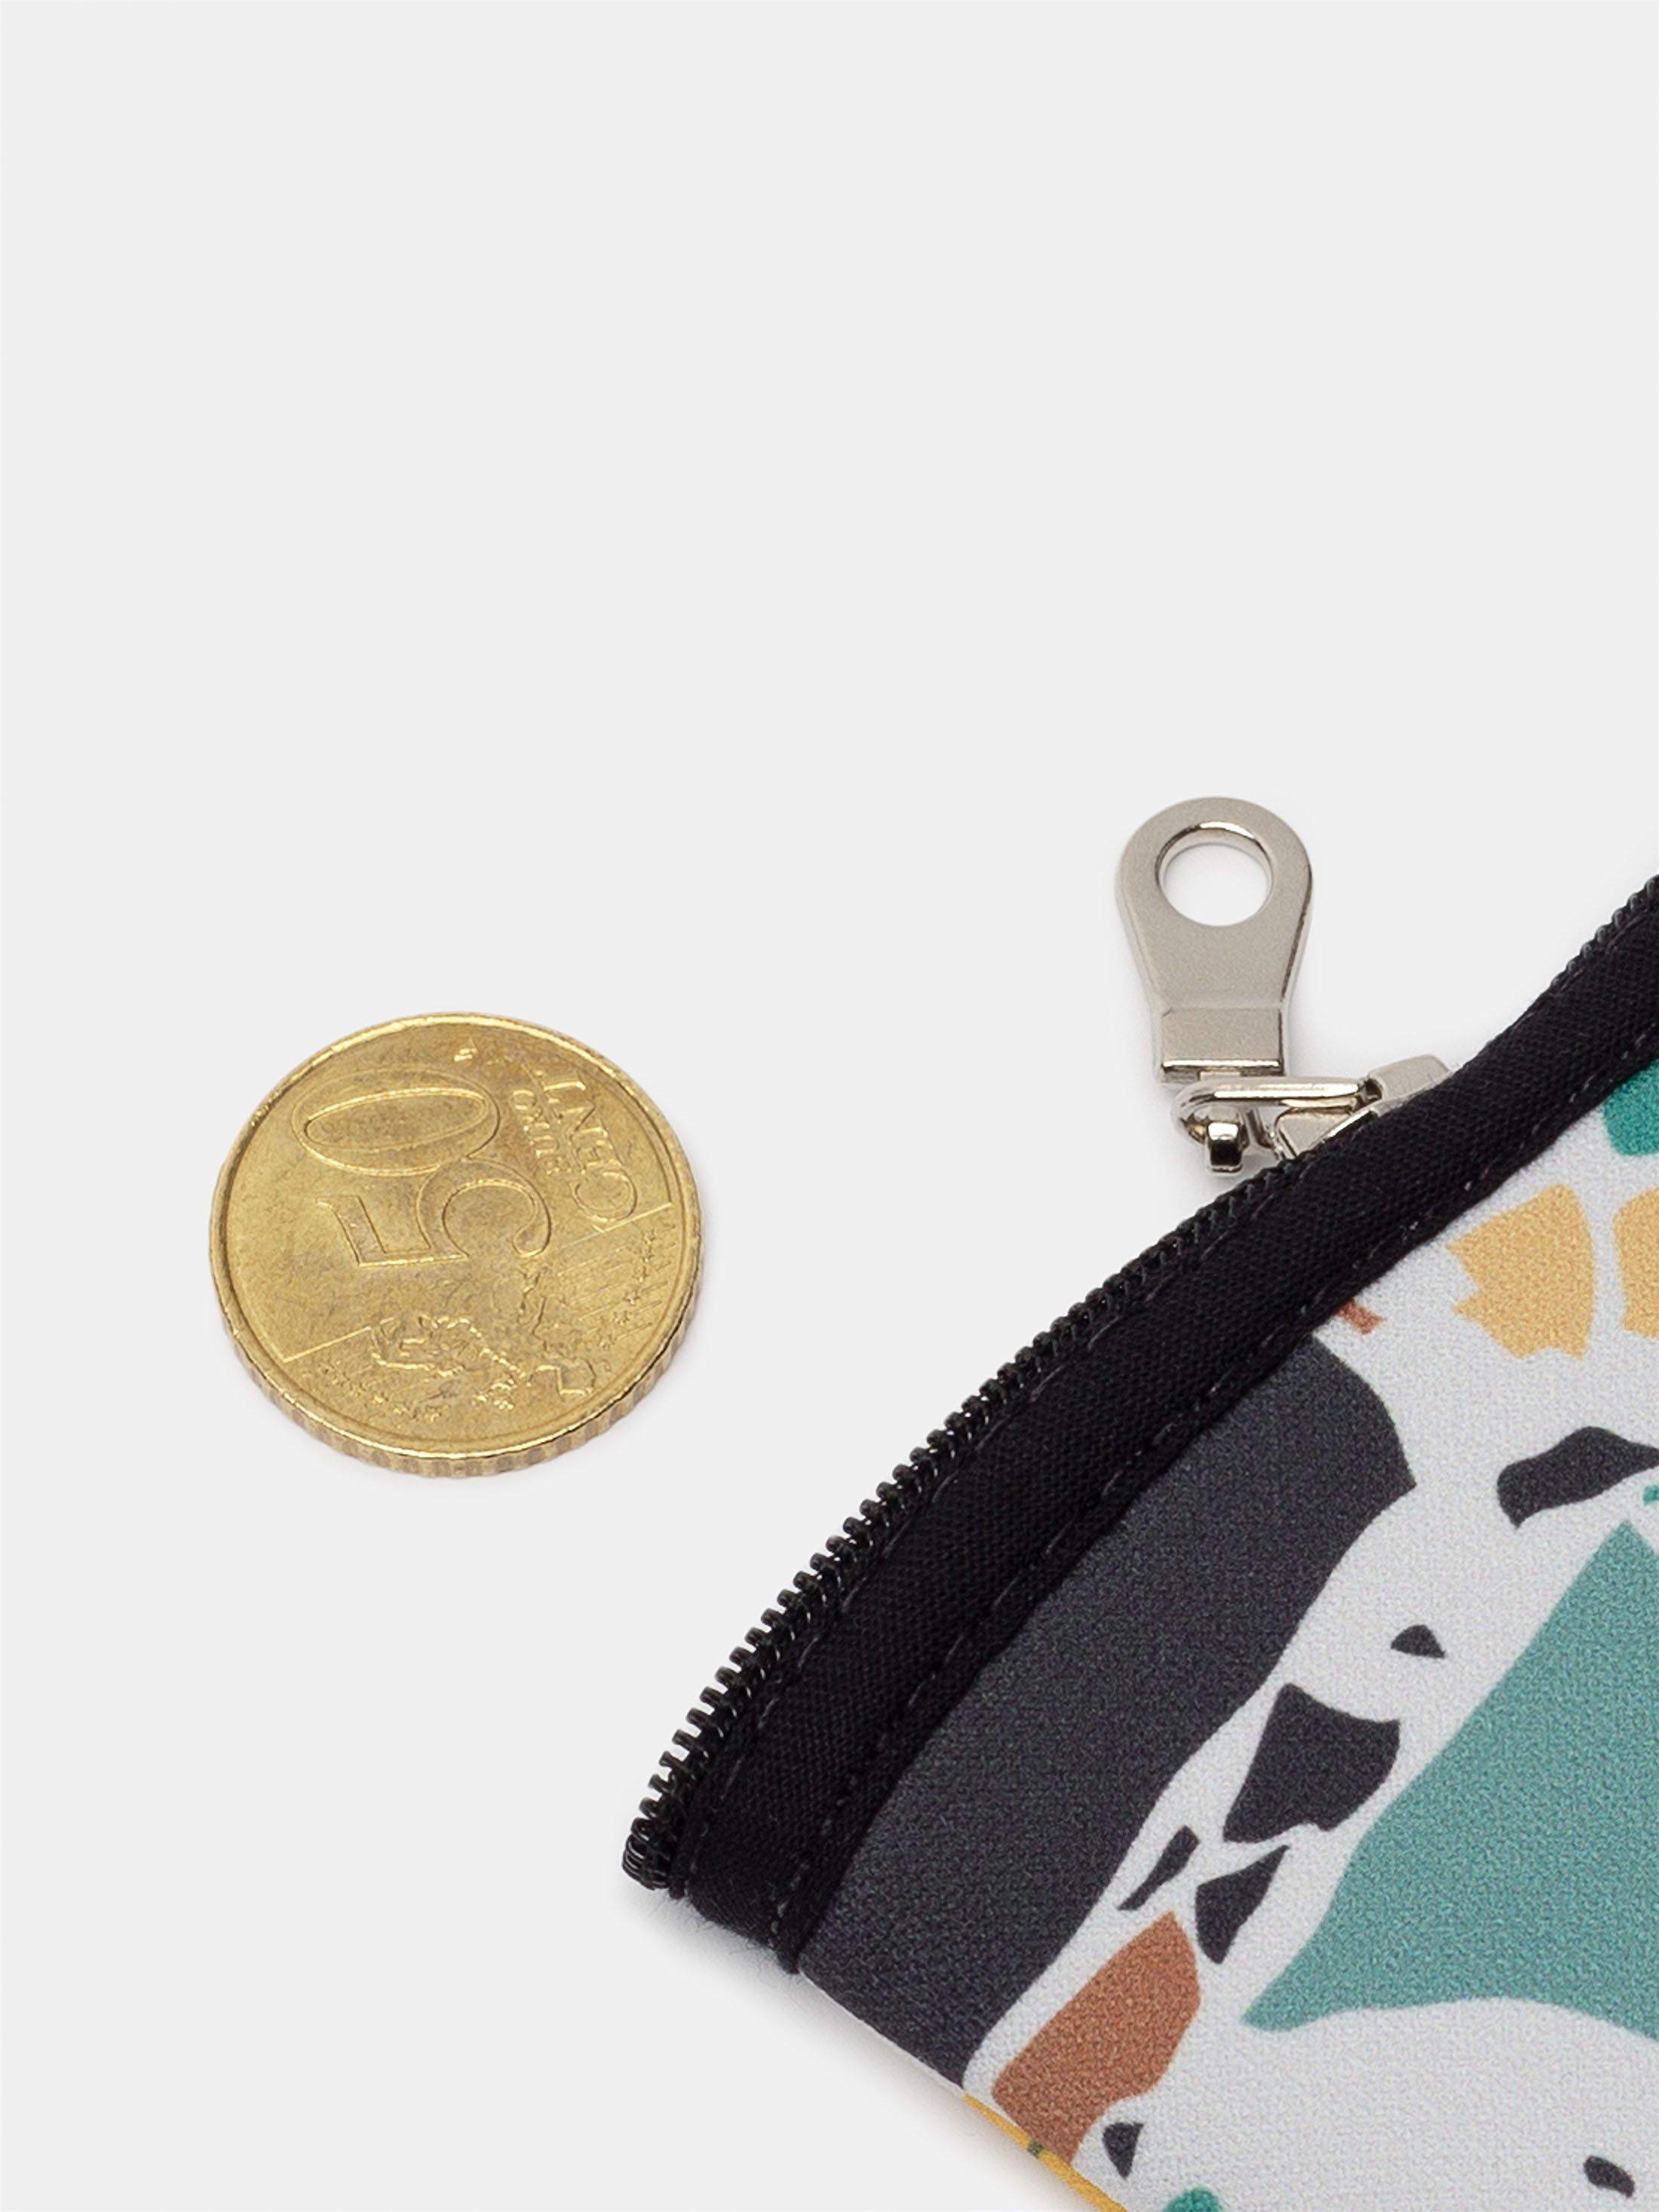 Design Printed Zipper Pouches